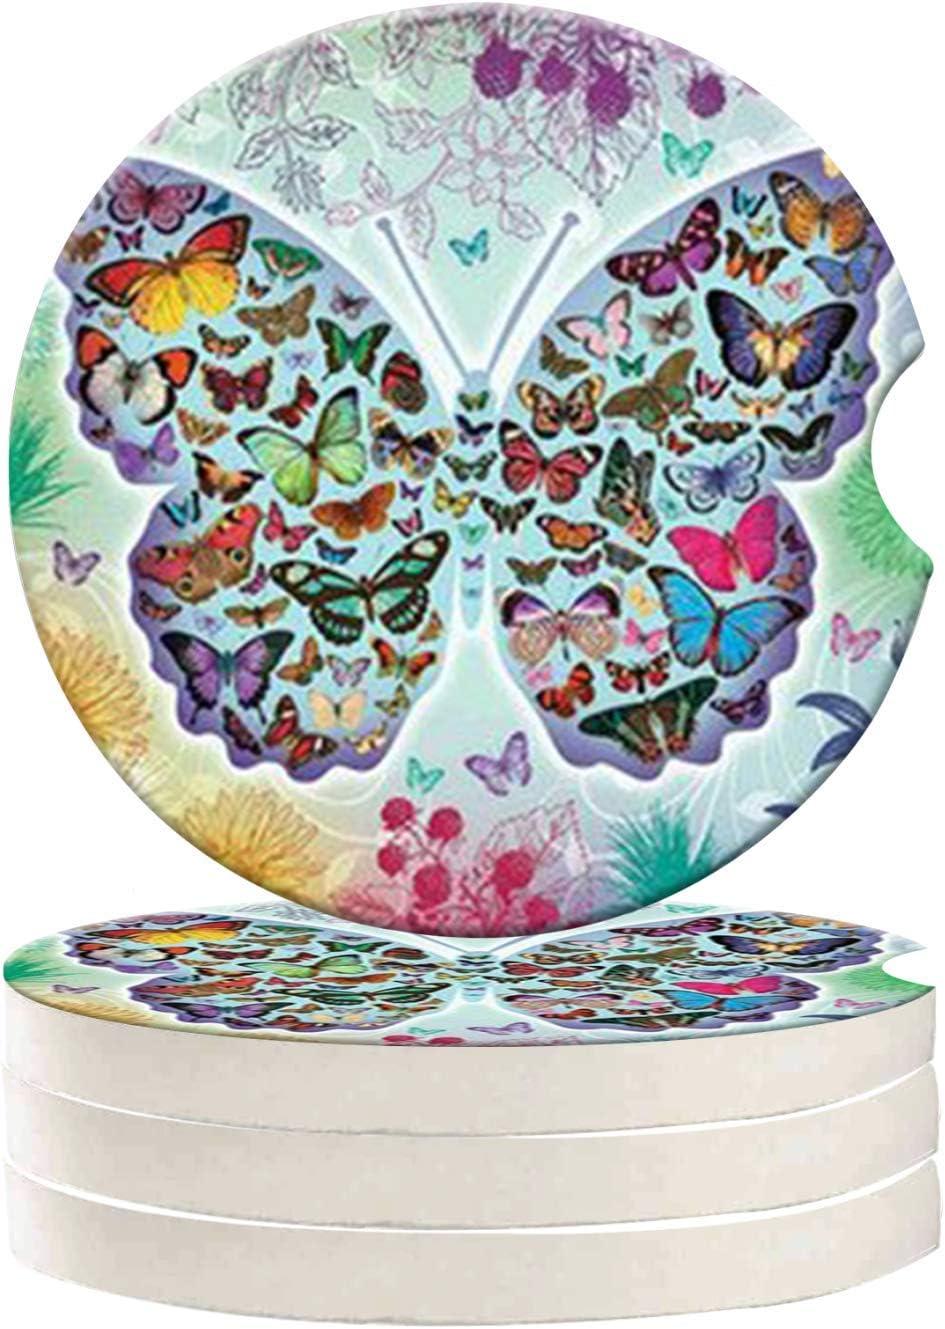 FQJNS Butterfly Custom Image Ceramic Car Coaster Auto Supplies Accessories Beverage Car Coaster 4-Piece Set 2.56 Inches Diameter